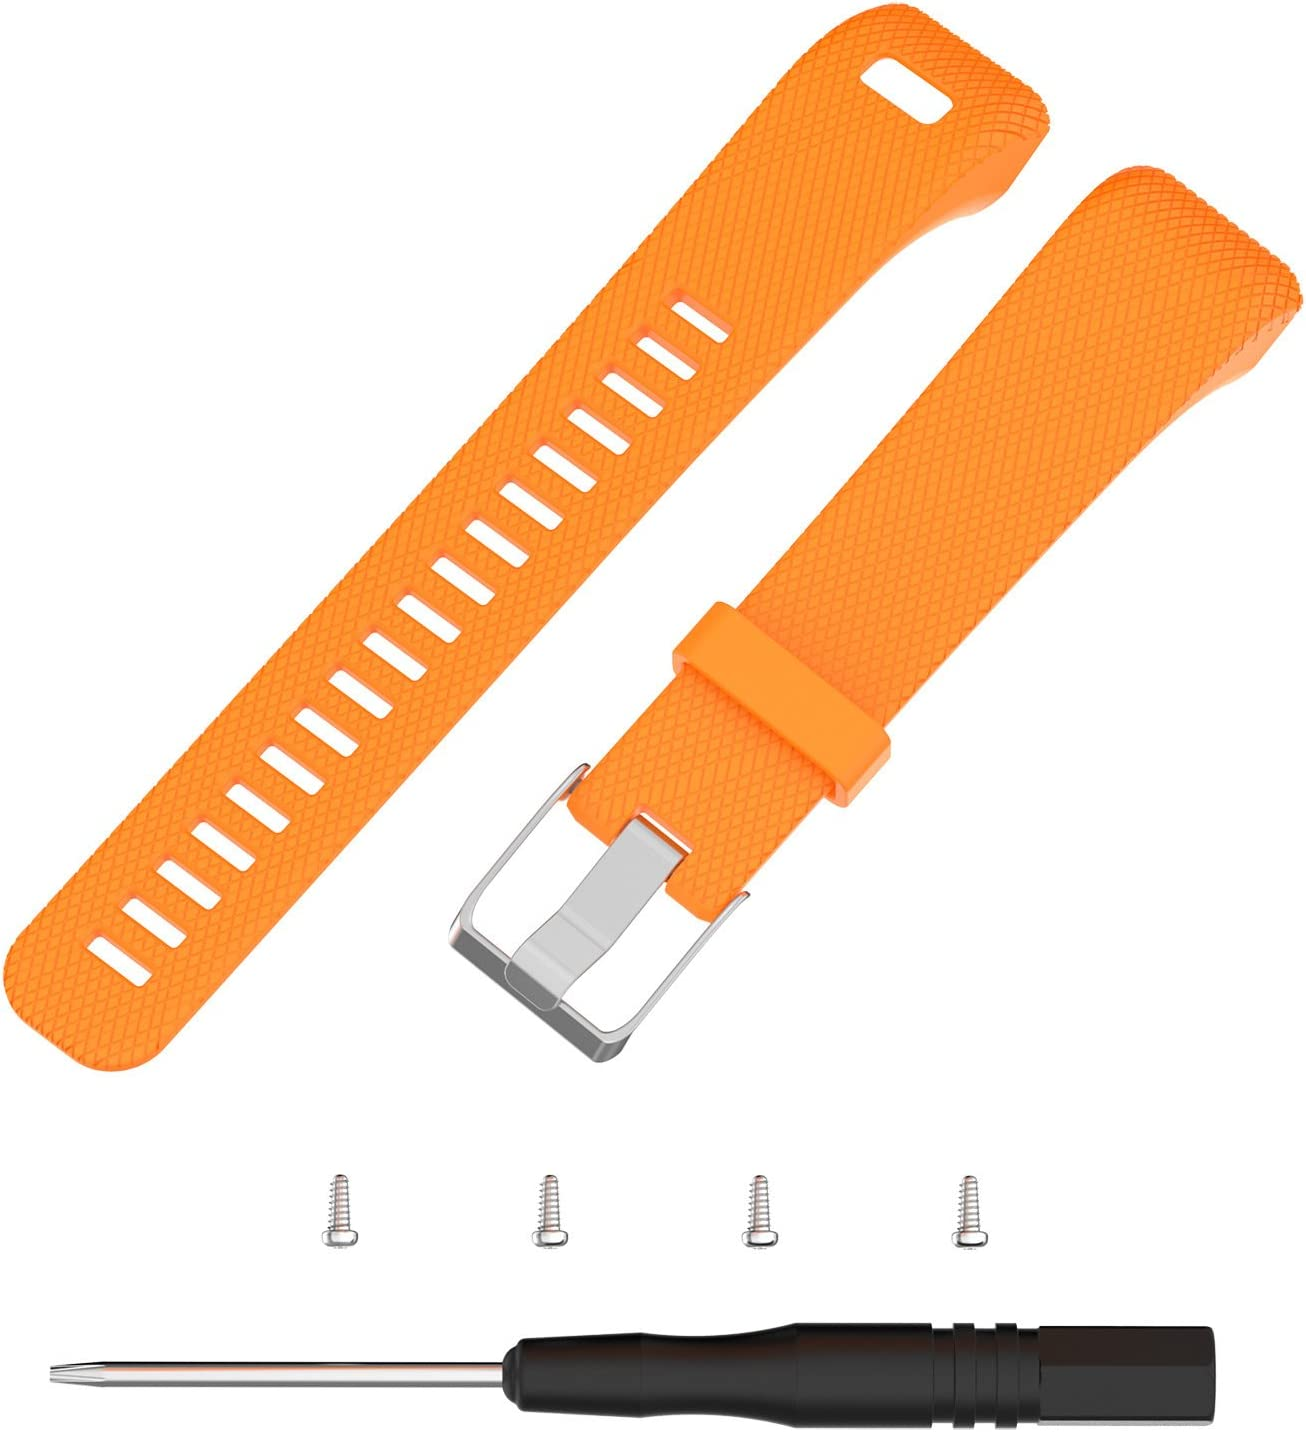 Replacement Silicone Band Straps Bracelet Wristbands for Vivosmart HR Plus Approach X10 Compatible with Garmin Vivosmart HR+ Bands Women Men Approach X40